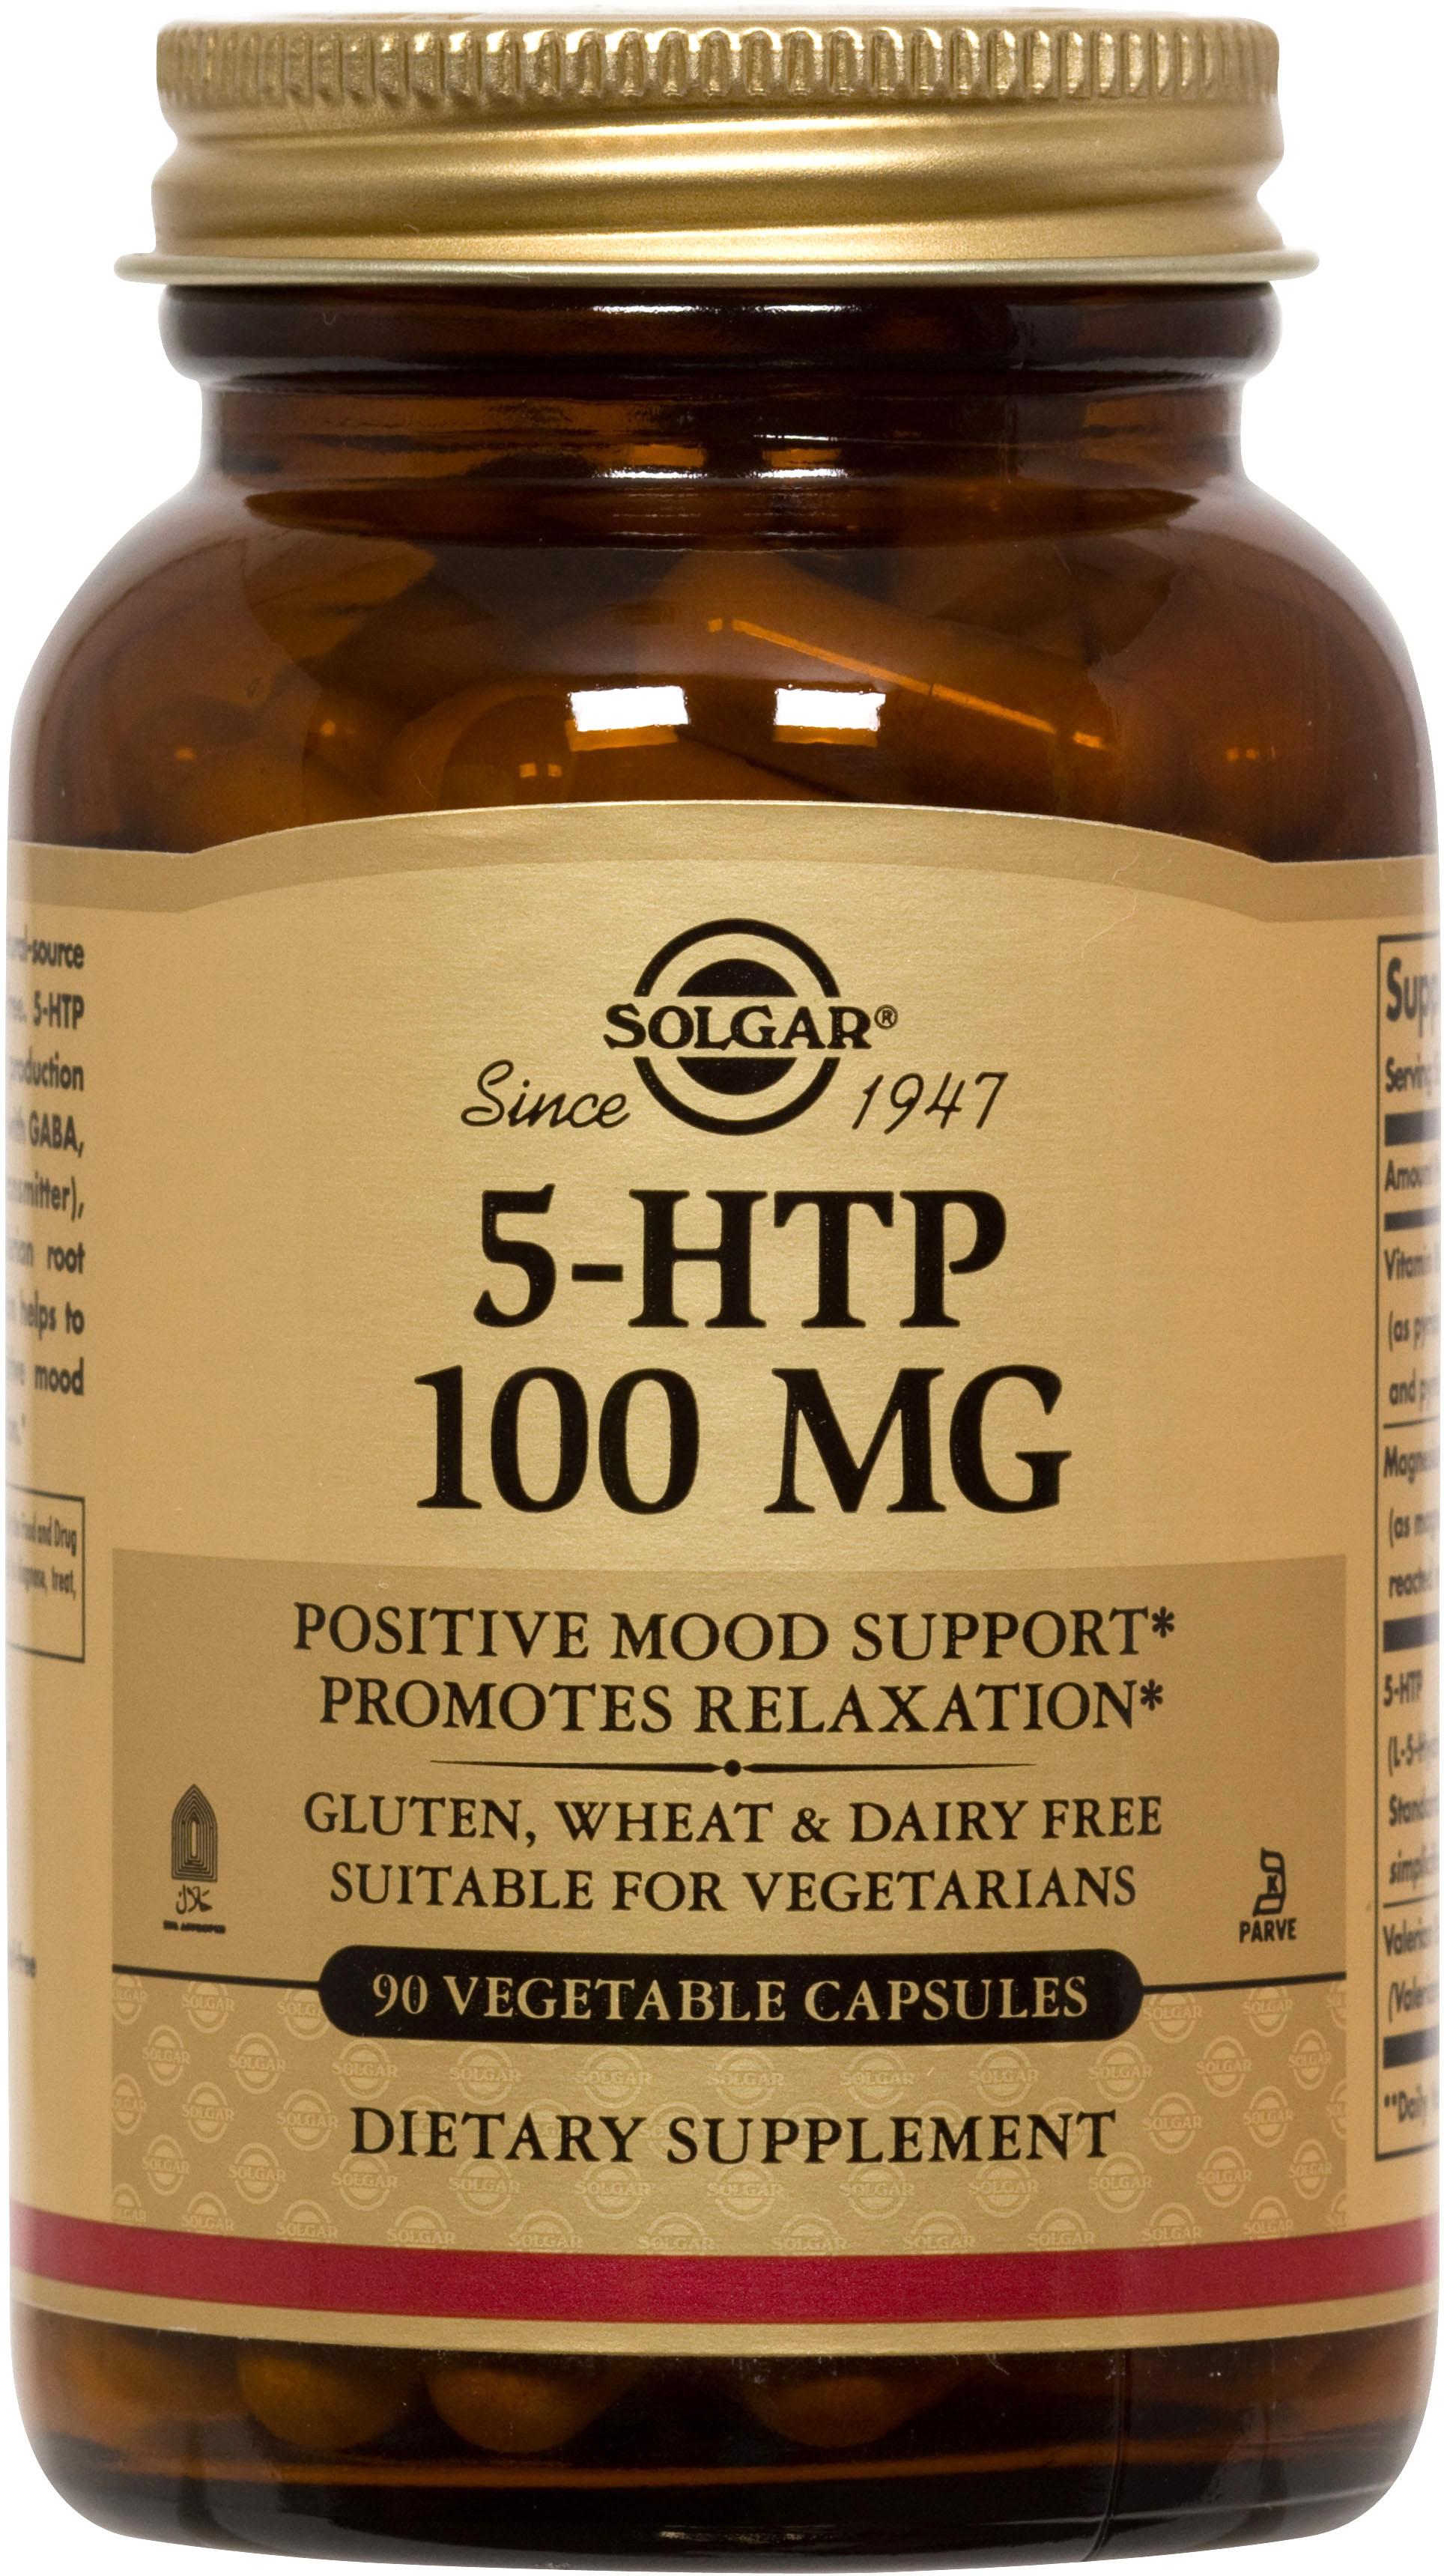 Solgar 5-HTP (5-Υδροξυ-Τρυπτοφανη) 100mg Συμπλήρωμα Διατροφής Απαραίτητο για την Καλή Υγεία του Εγκεφάλου veg.caps – 90 caps